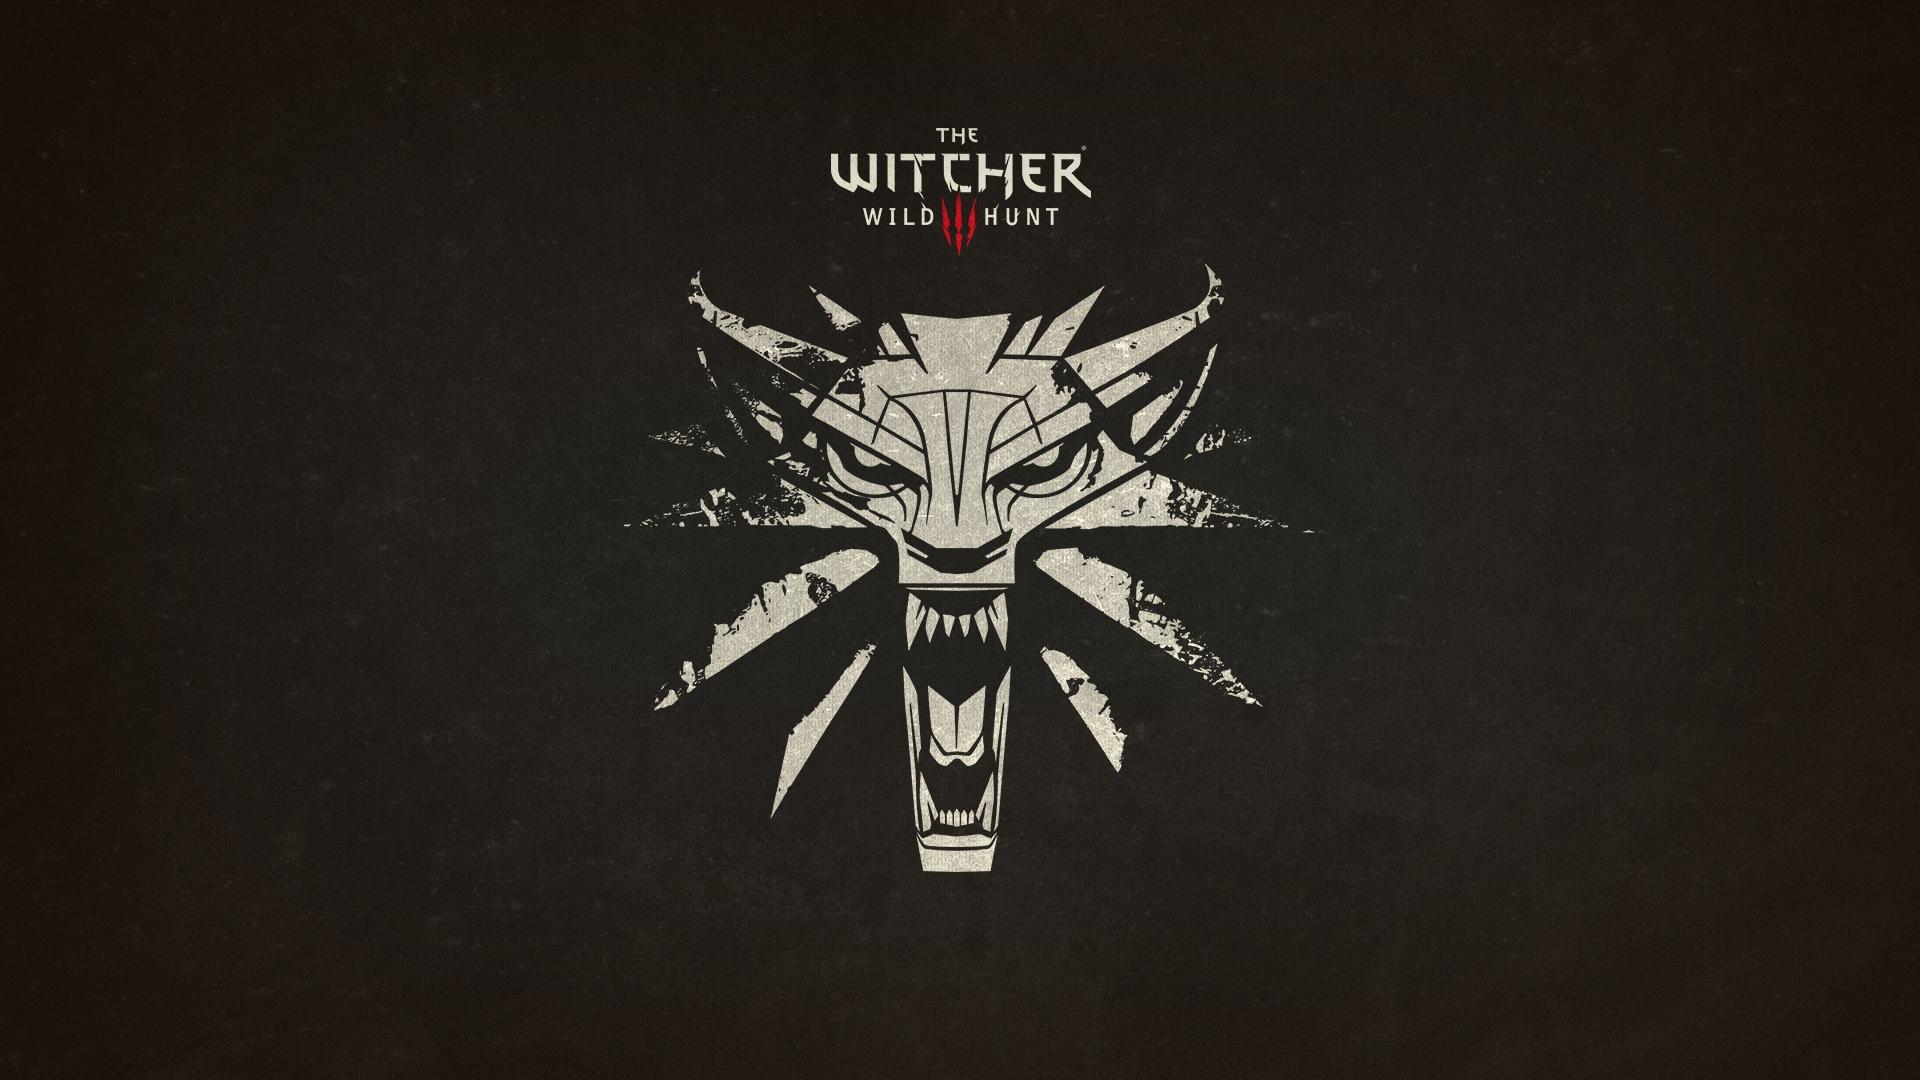 Witcher 3 Wallpaper HD - WallpaperSafari